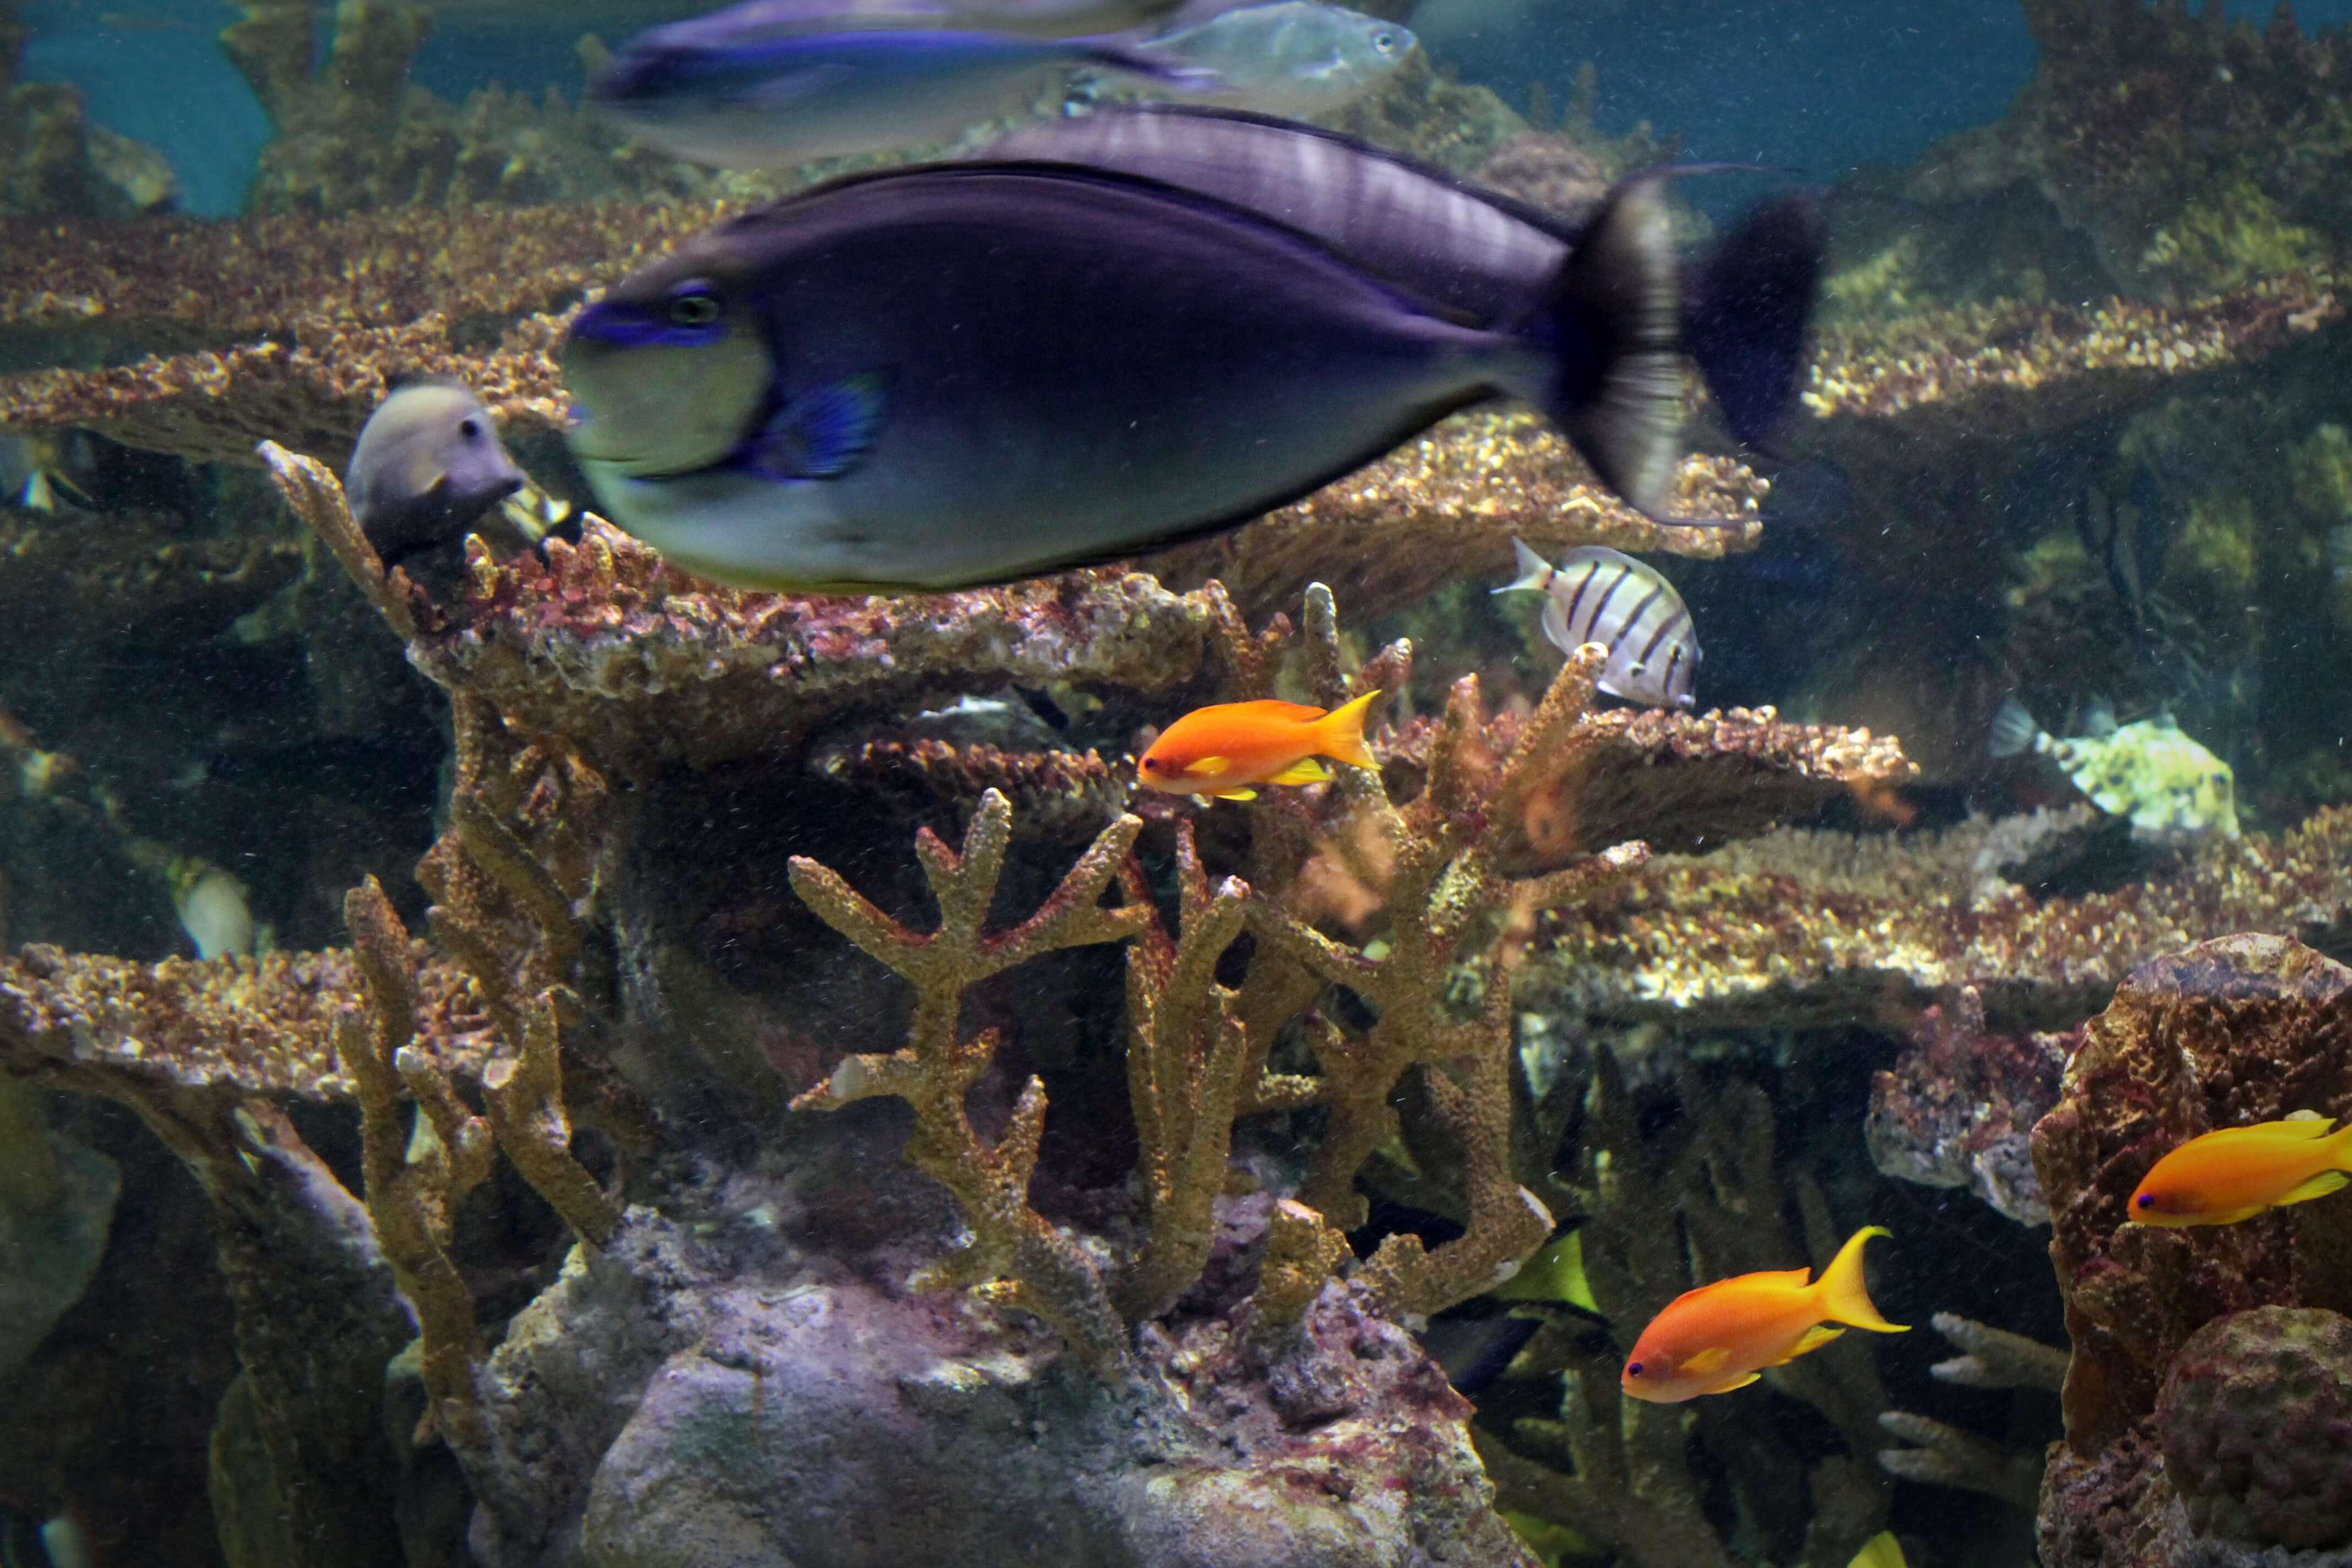 The New England Aquarium   Kicking Back the Pebbles